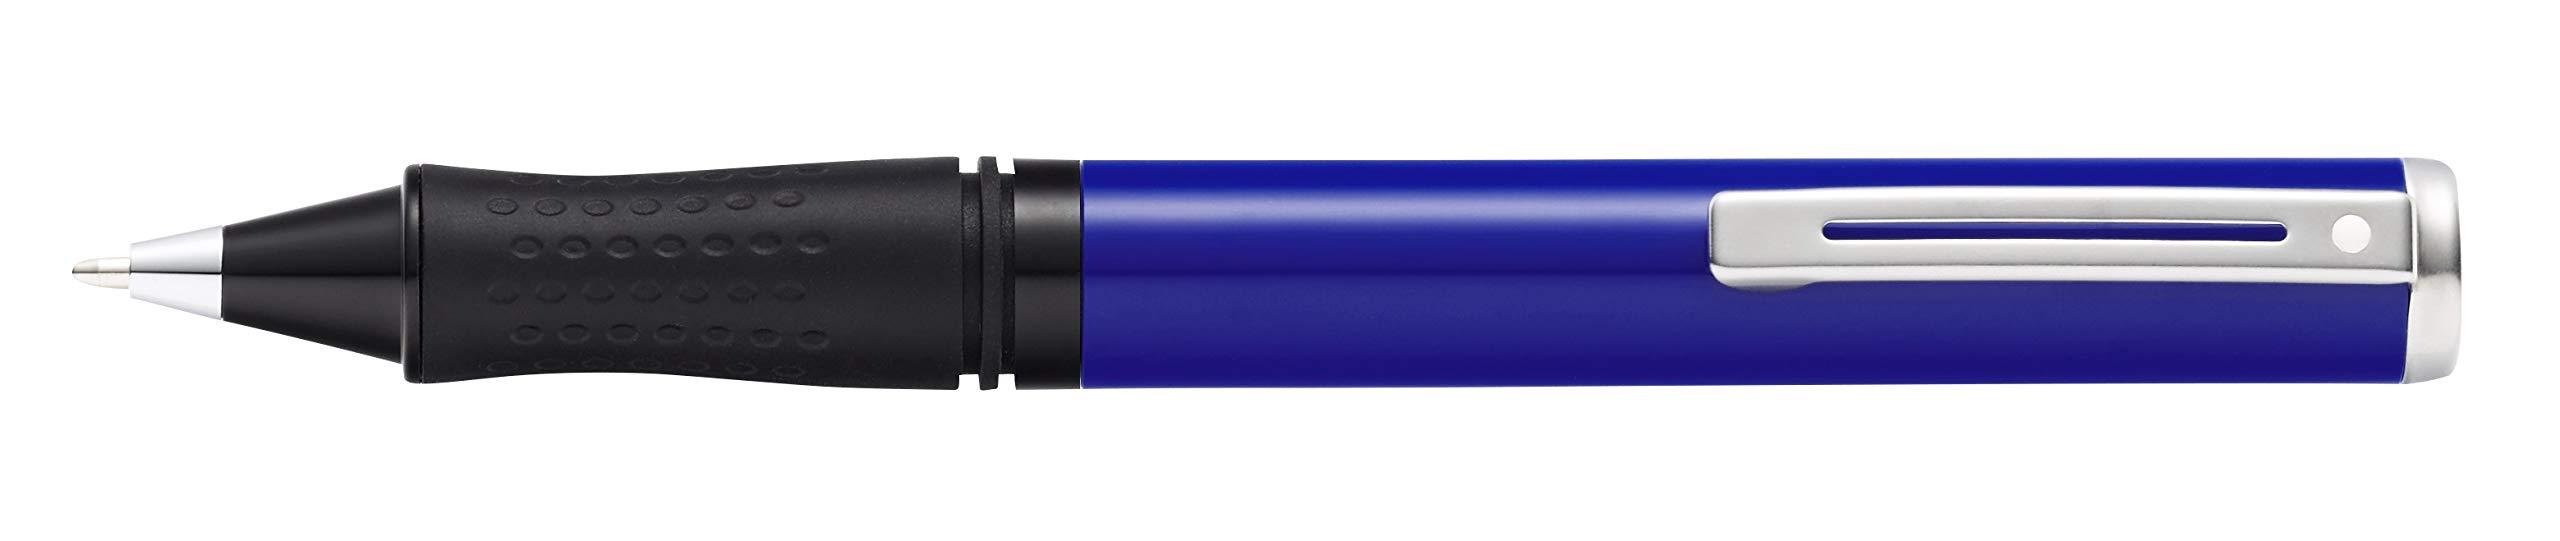 Sheaffer Pop Glossy Blue Ballpoint Pen with Chrome Trim